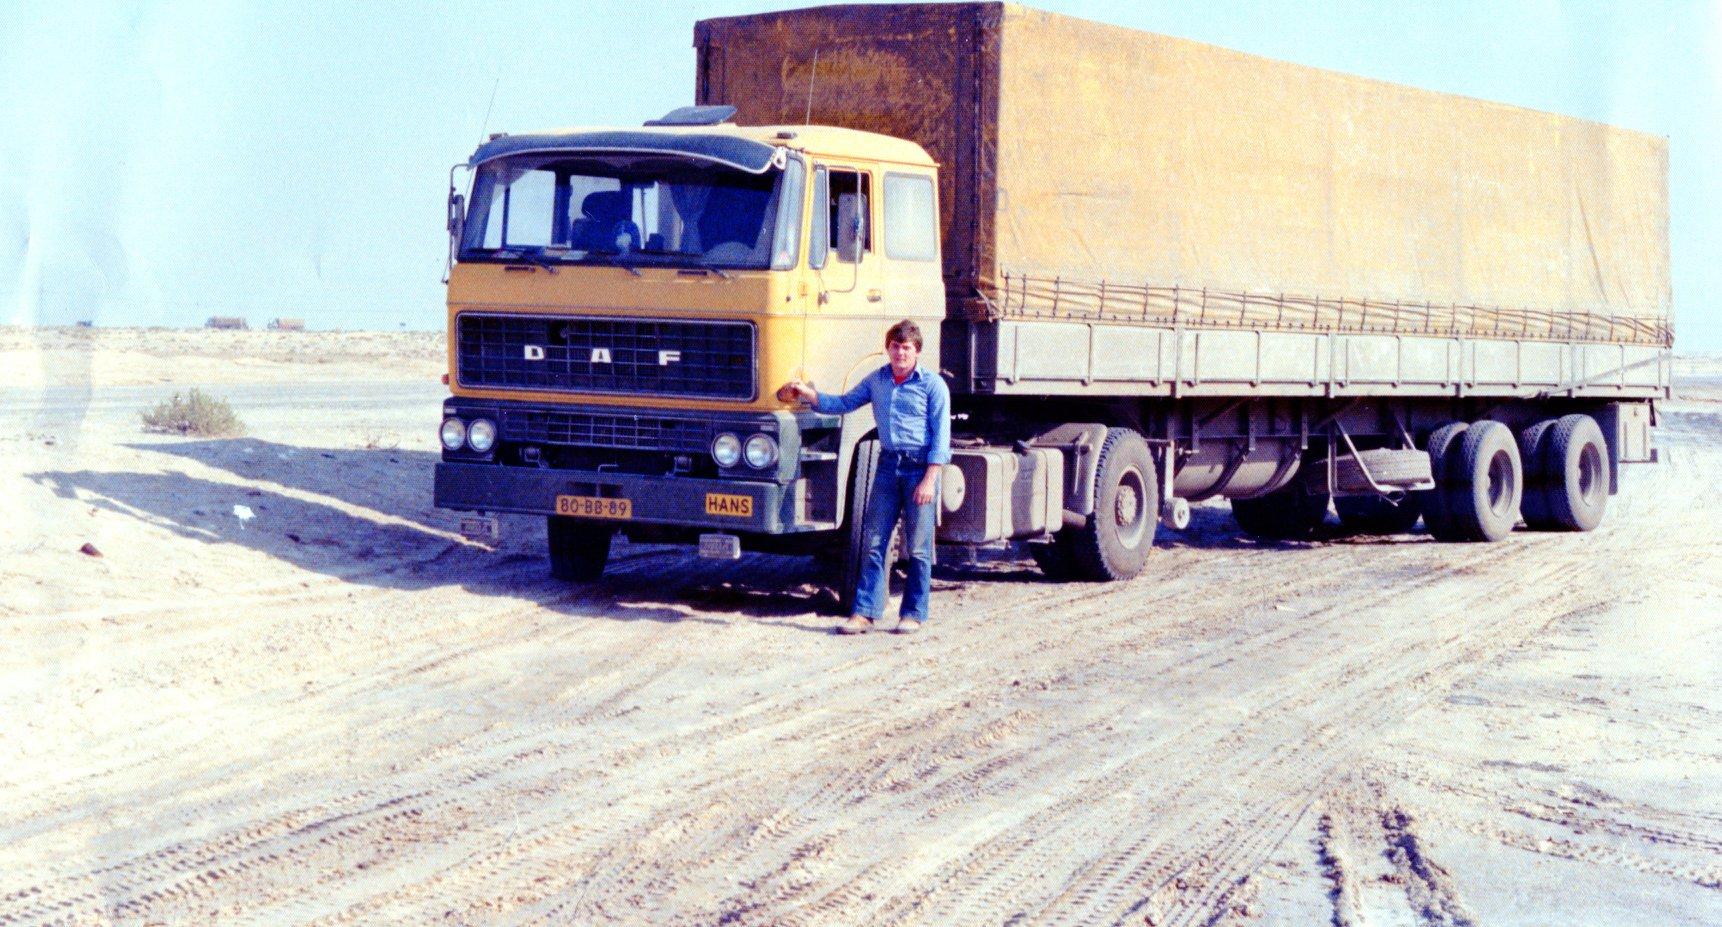 Hans-Anthonise-midden-oosten-transport-34